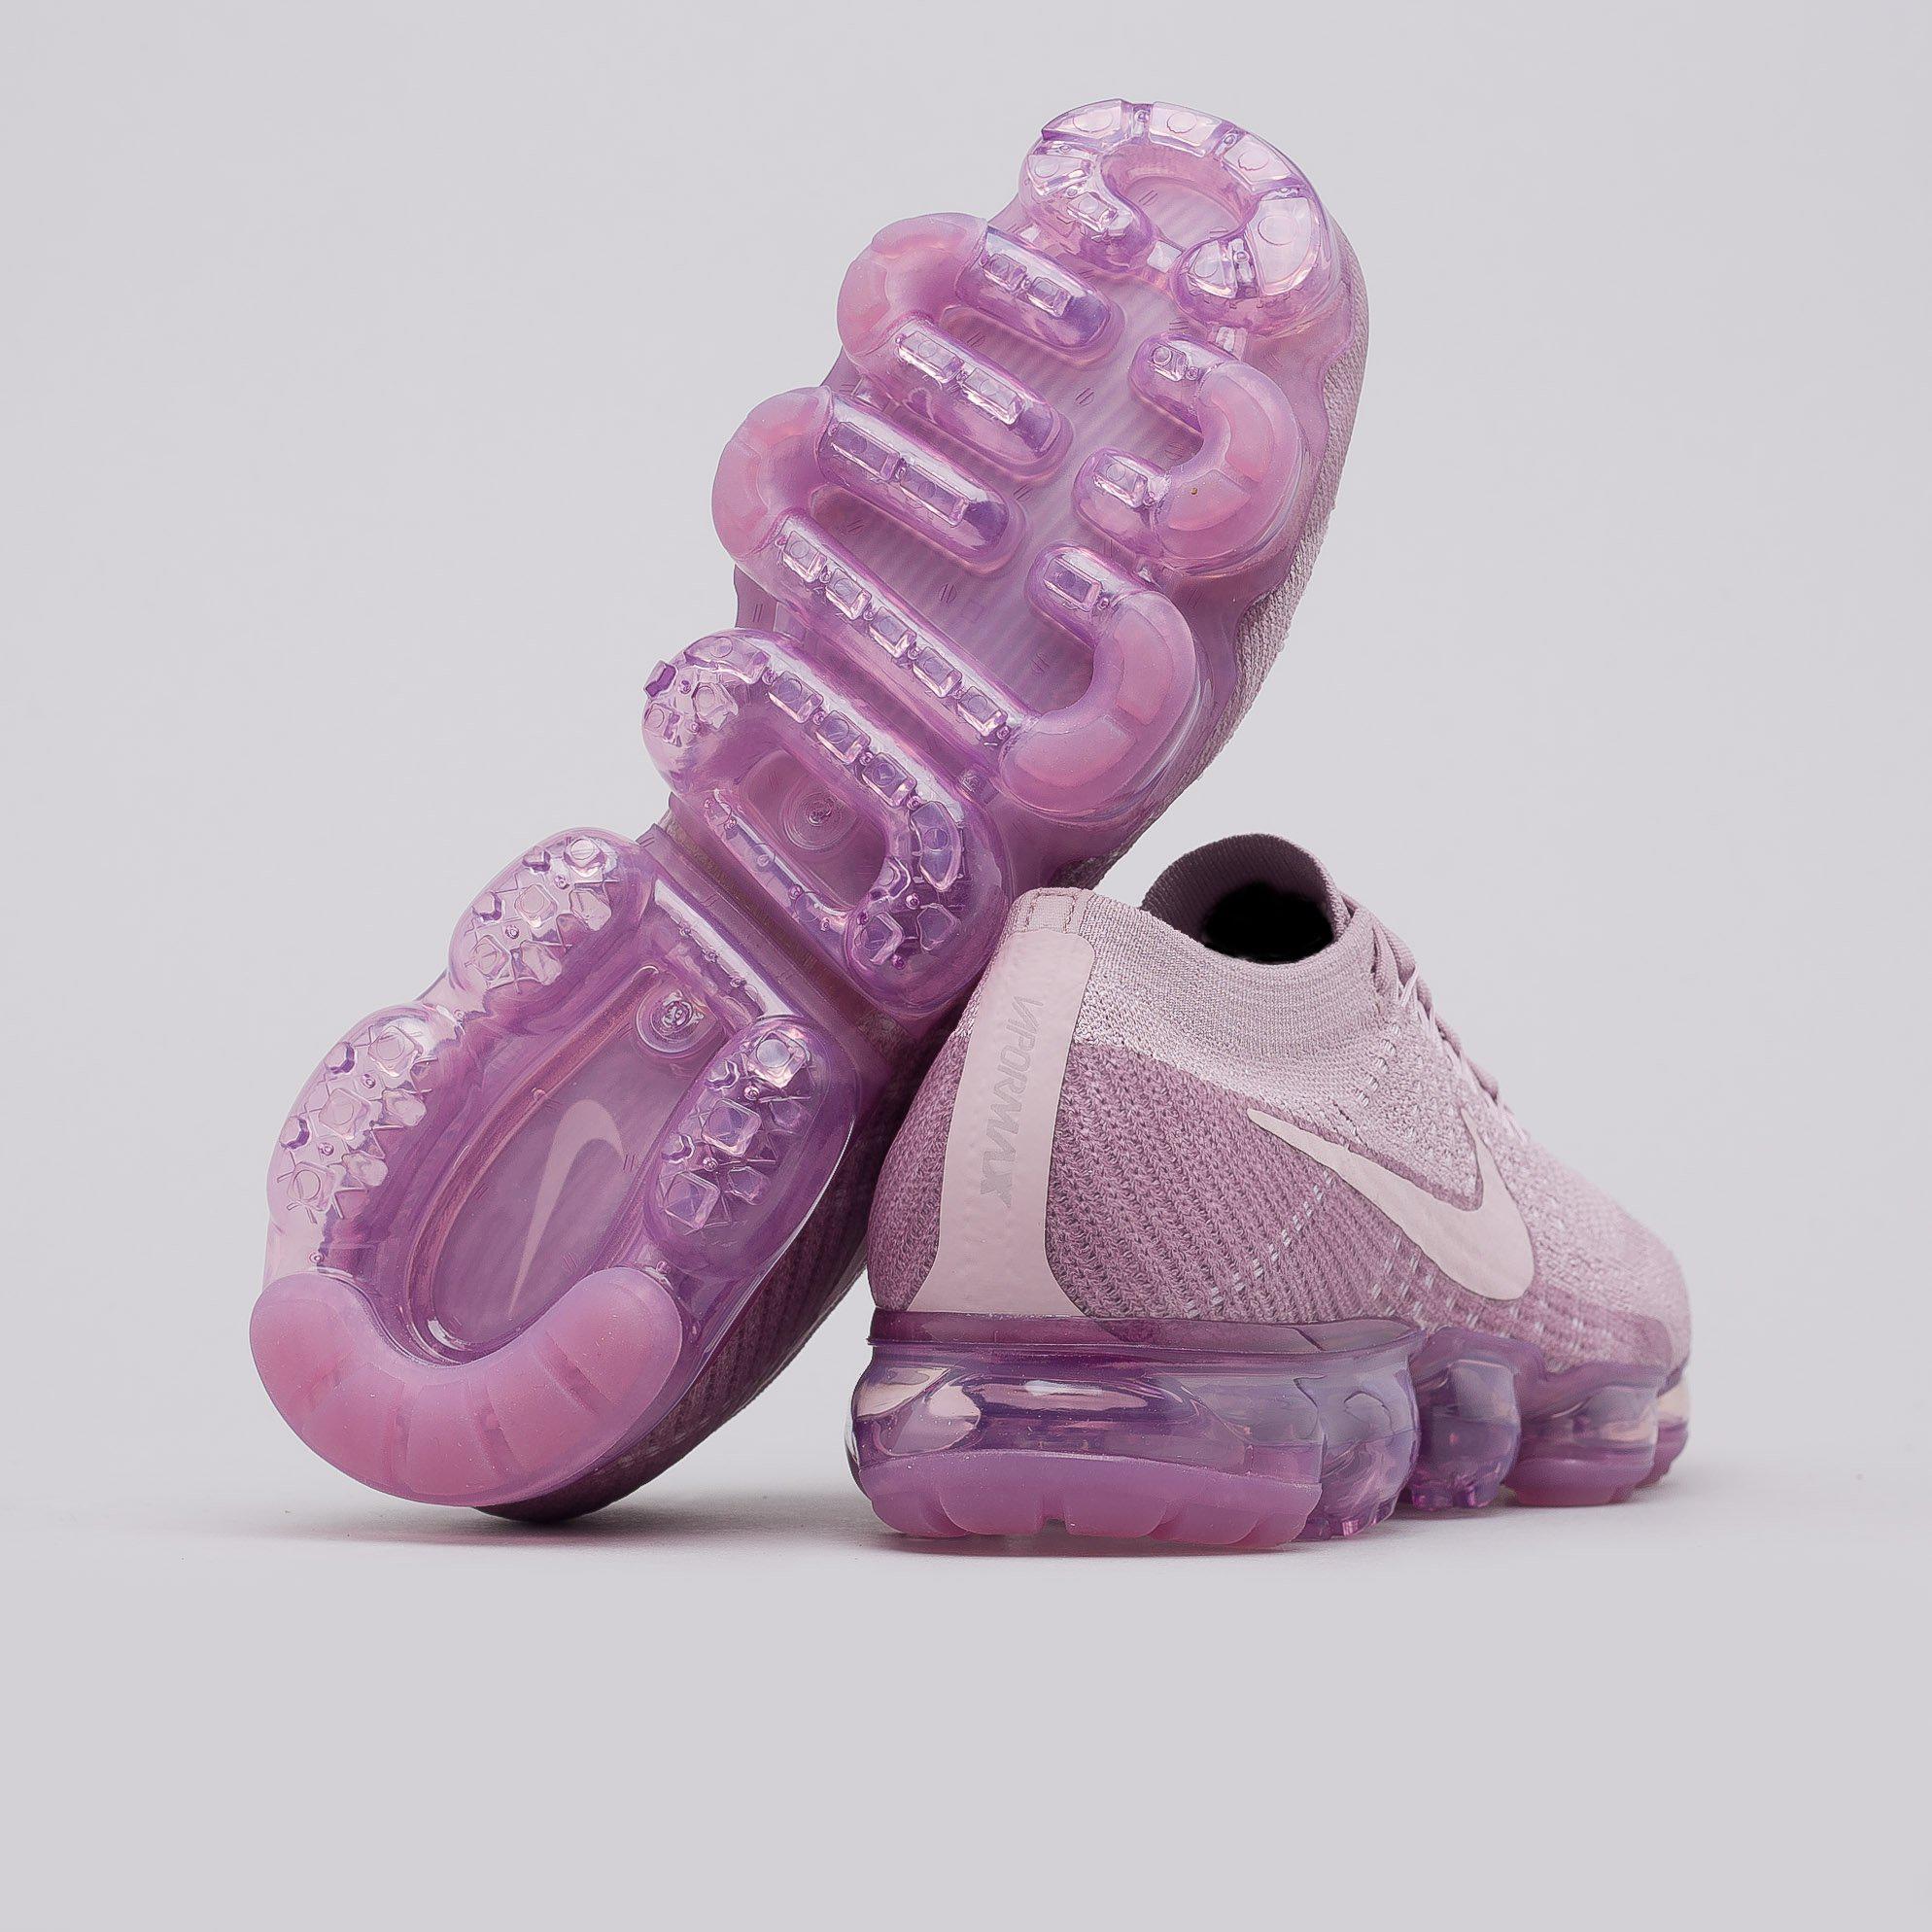 finest selection 92935 229d0 Nike Purple Women's Air Vapormax Flyknit In Violet Dust for men